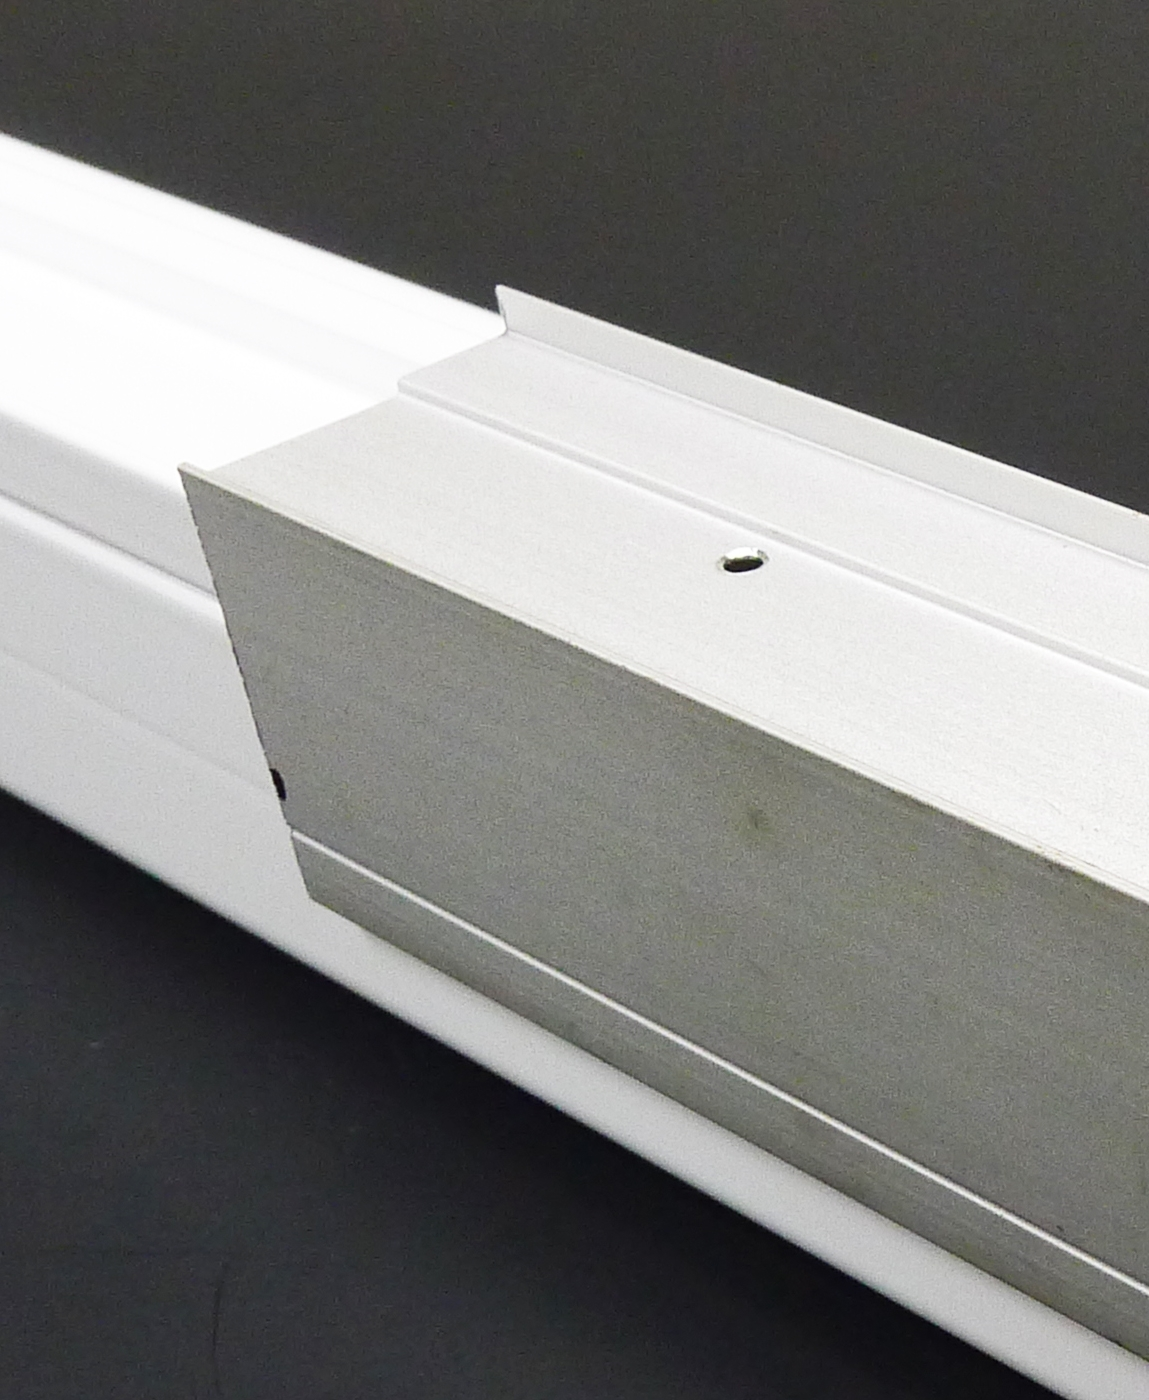 KST-SL01 橫拉窗電動開窗器_7